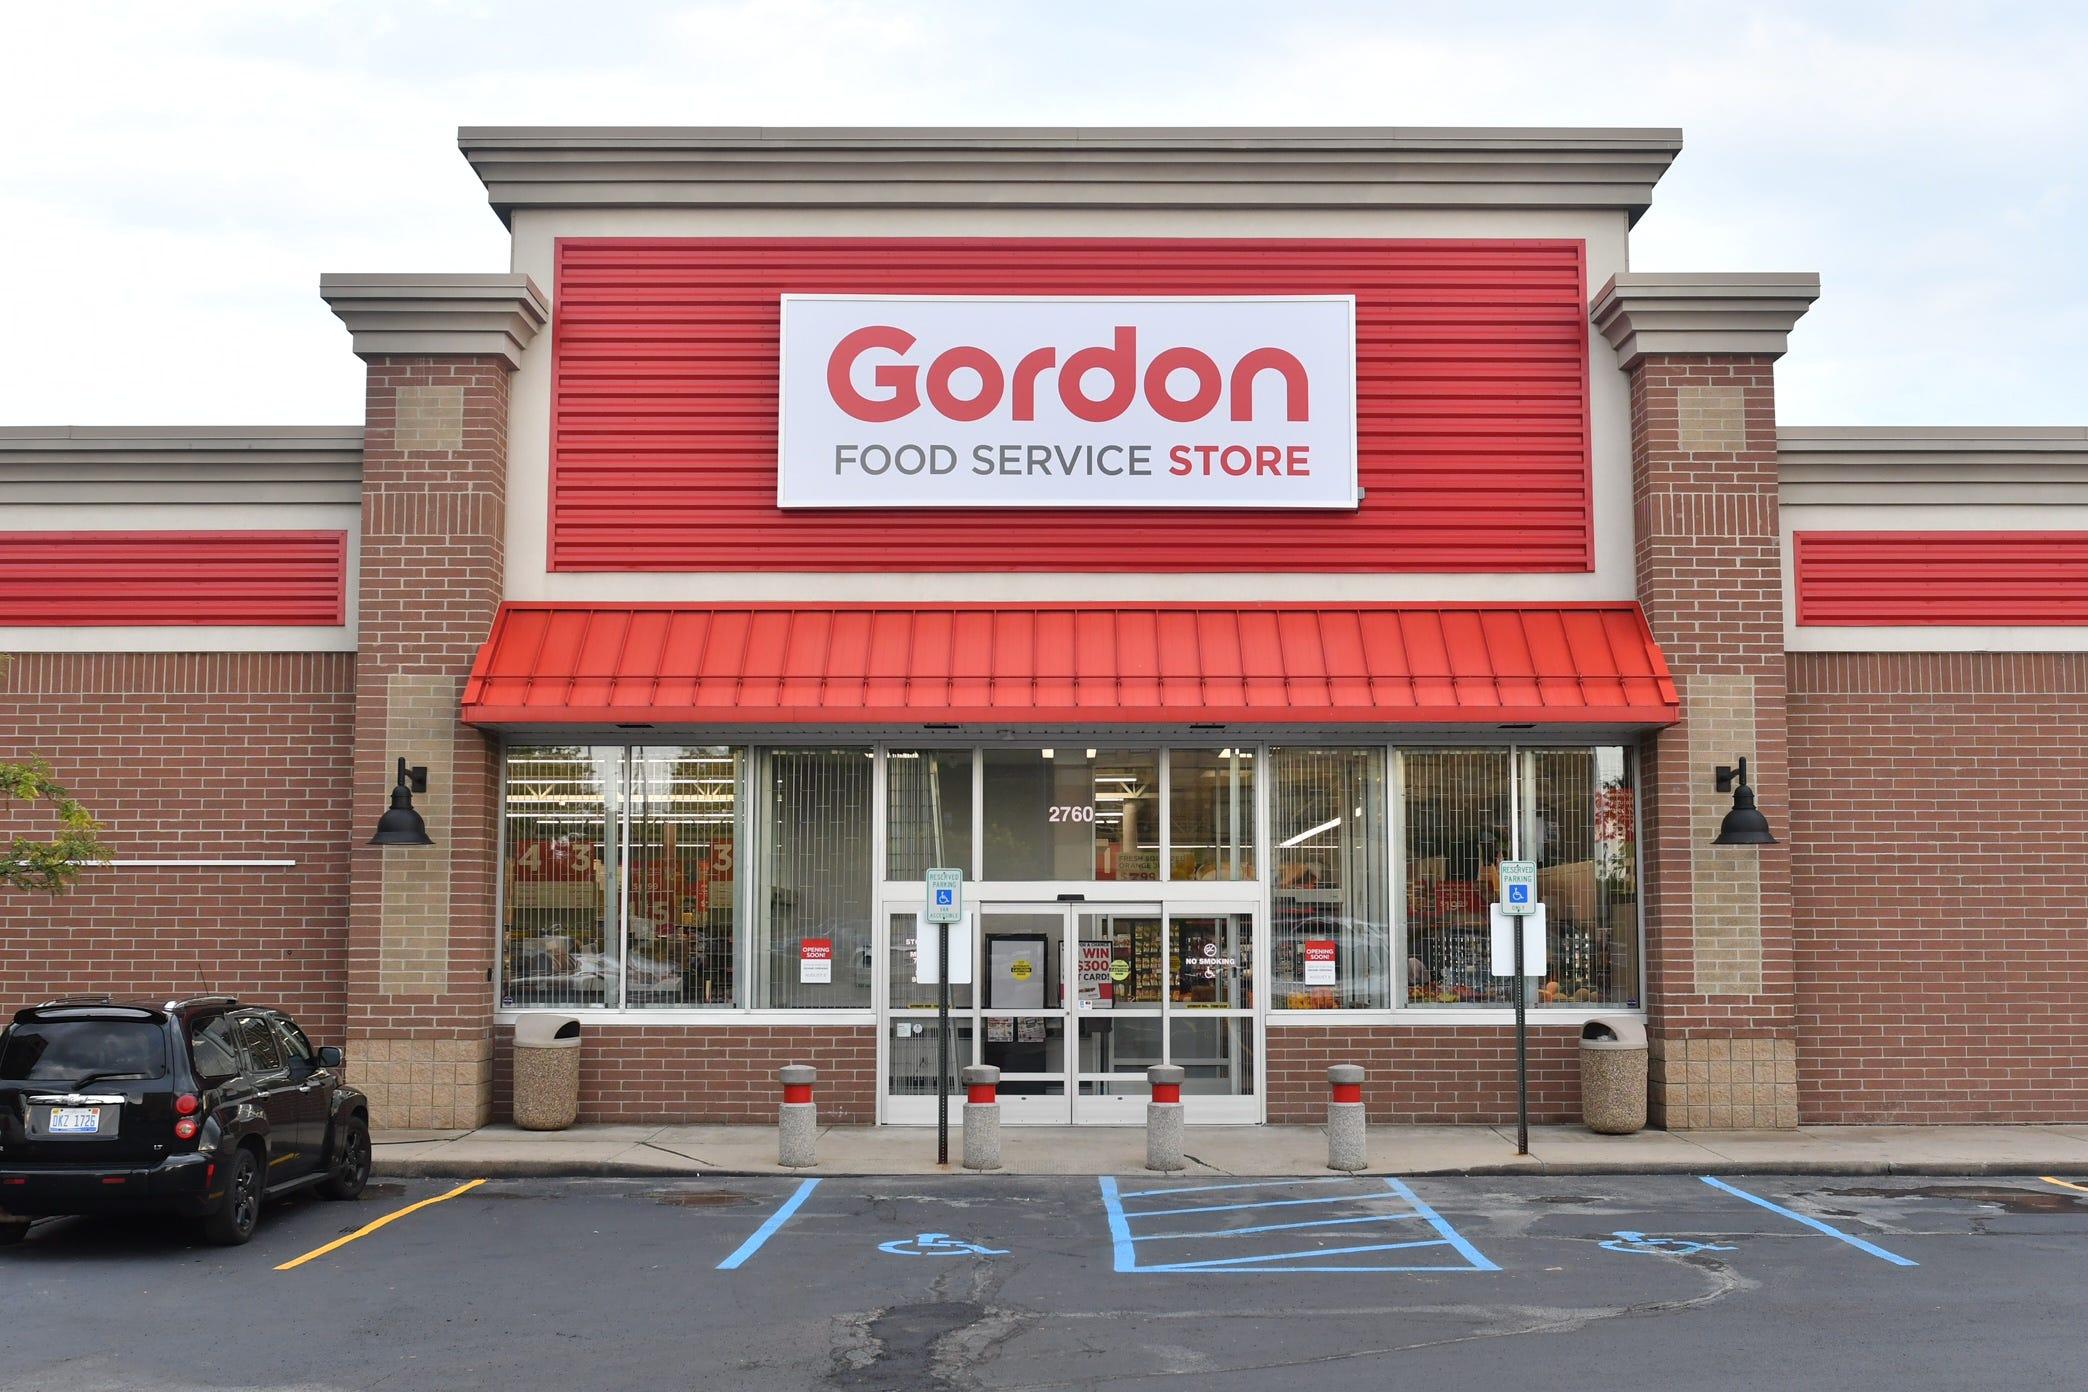 photograph regarding Gordon Food Service Coupons Printable called gordon meals retailer -